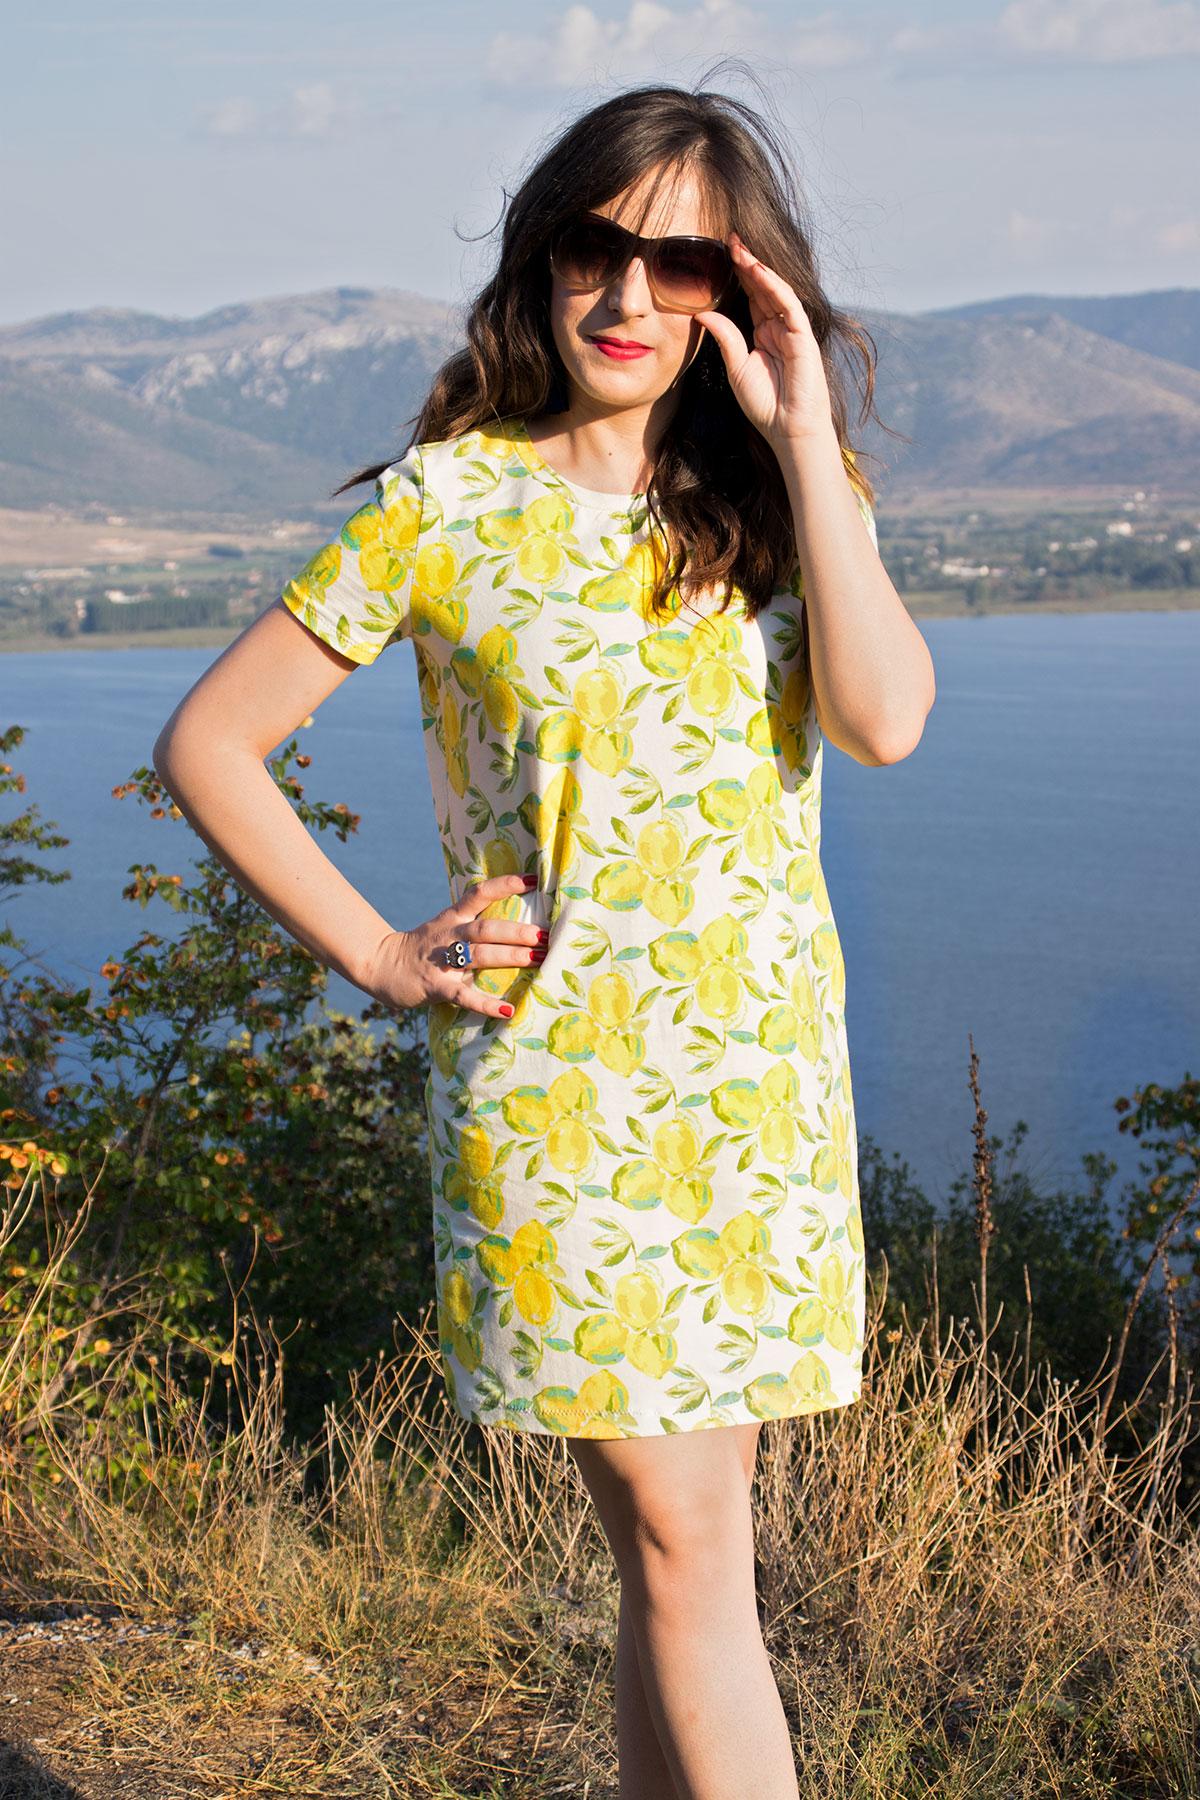 Sheona dress and top